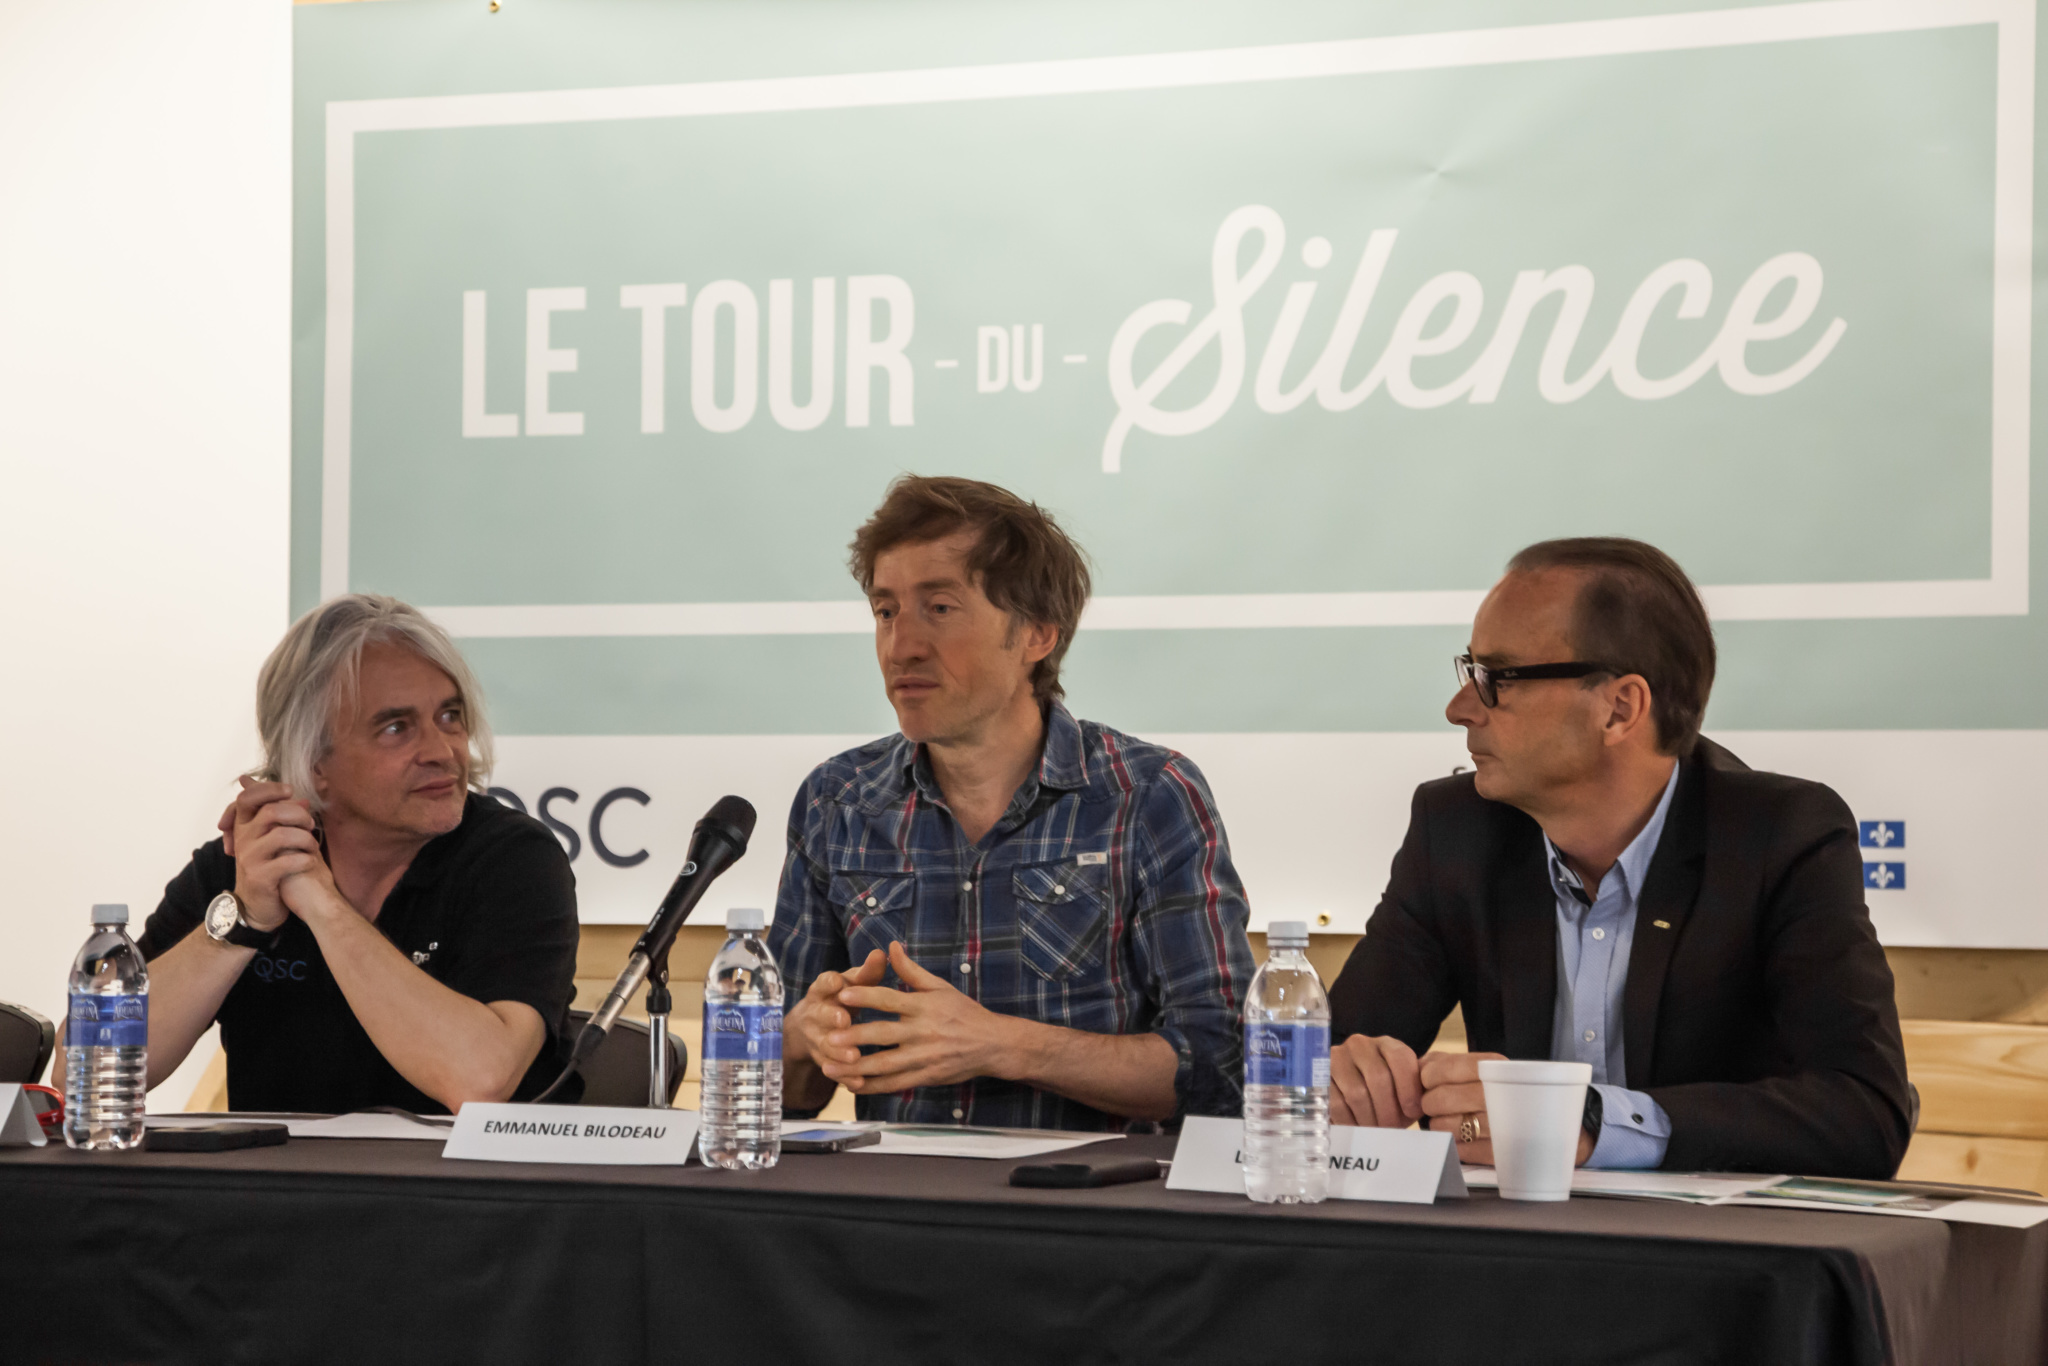 Tourdusilence Conference 9171